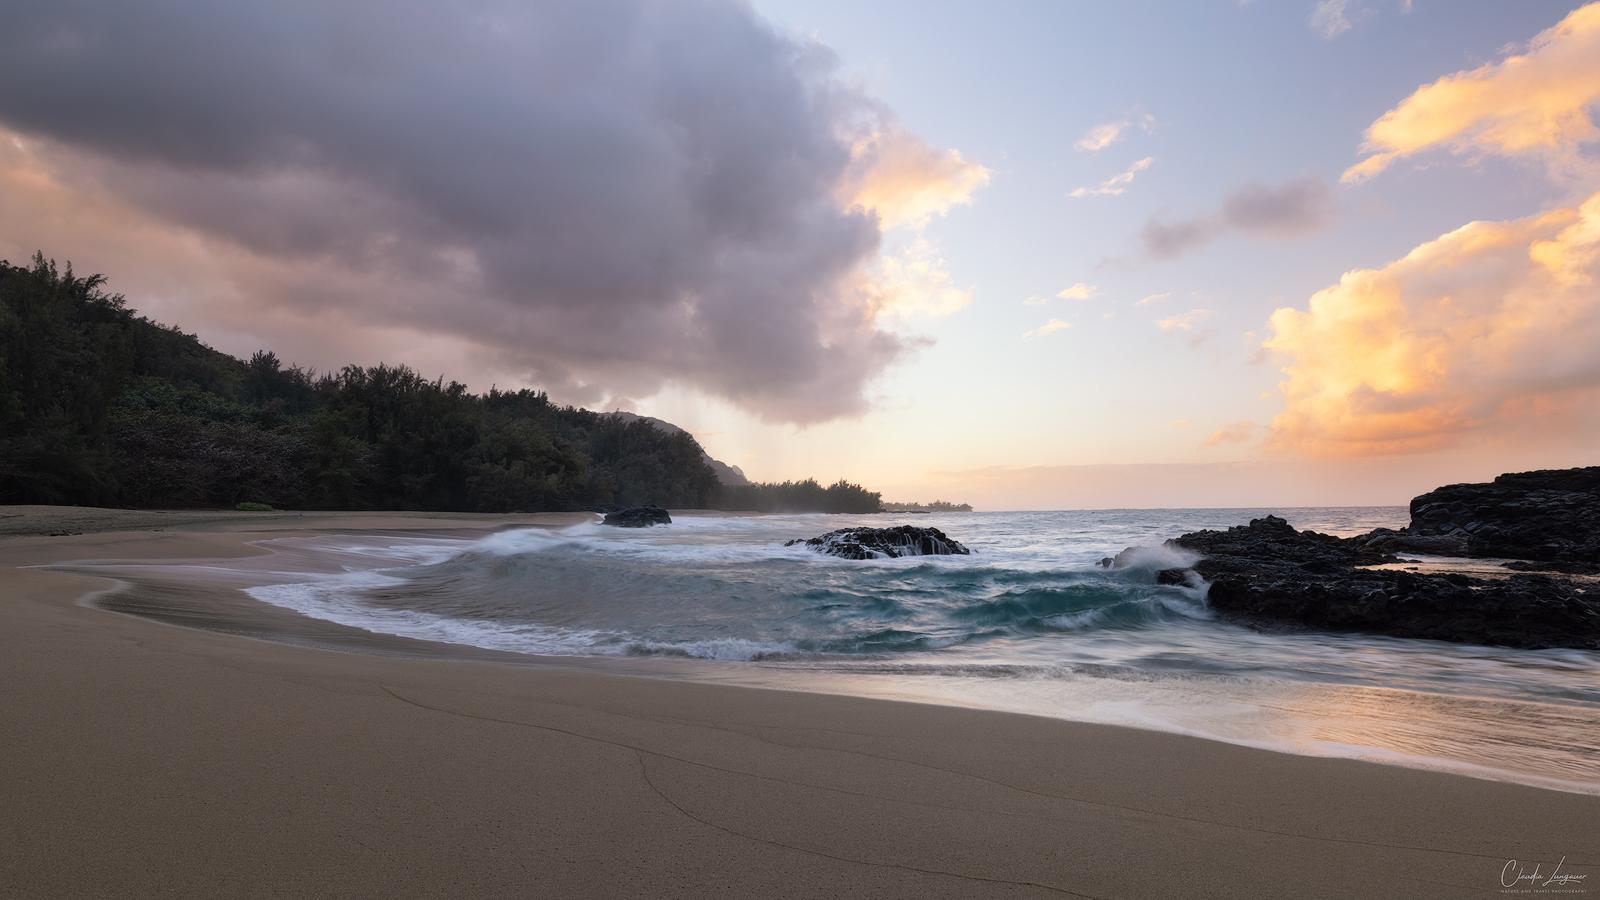 Big waves at Kahalahala Beach on the north shore of Kauai island in Hawaii.